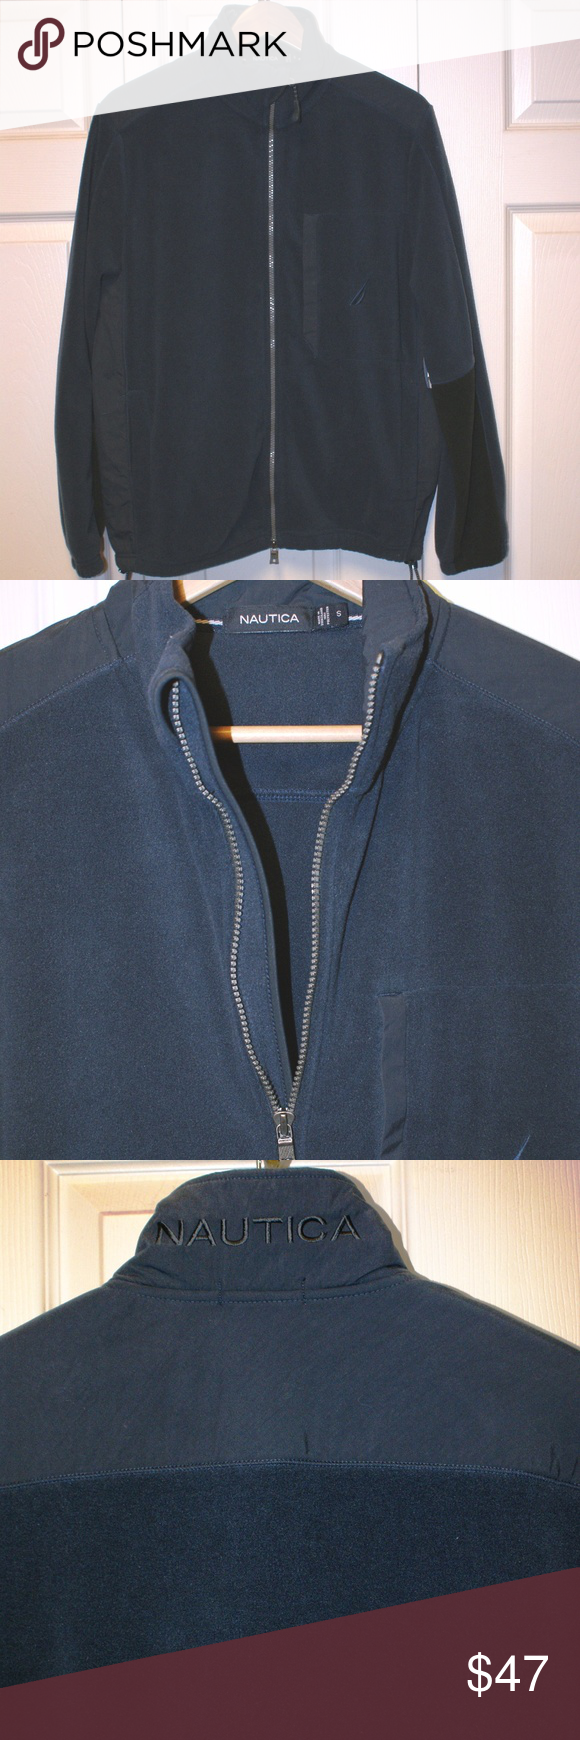 Menus nautica fleece jacket small smoking and zip